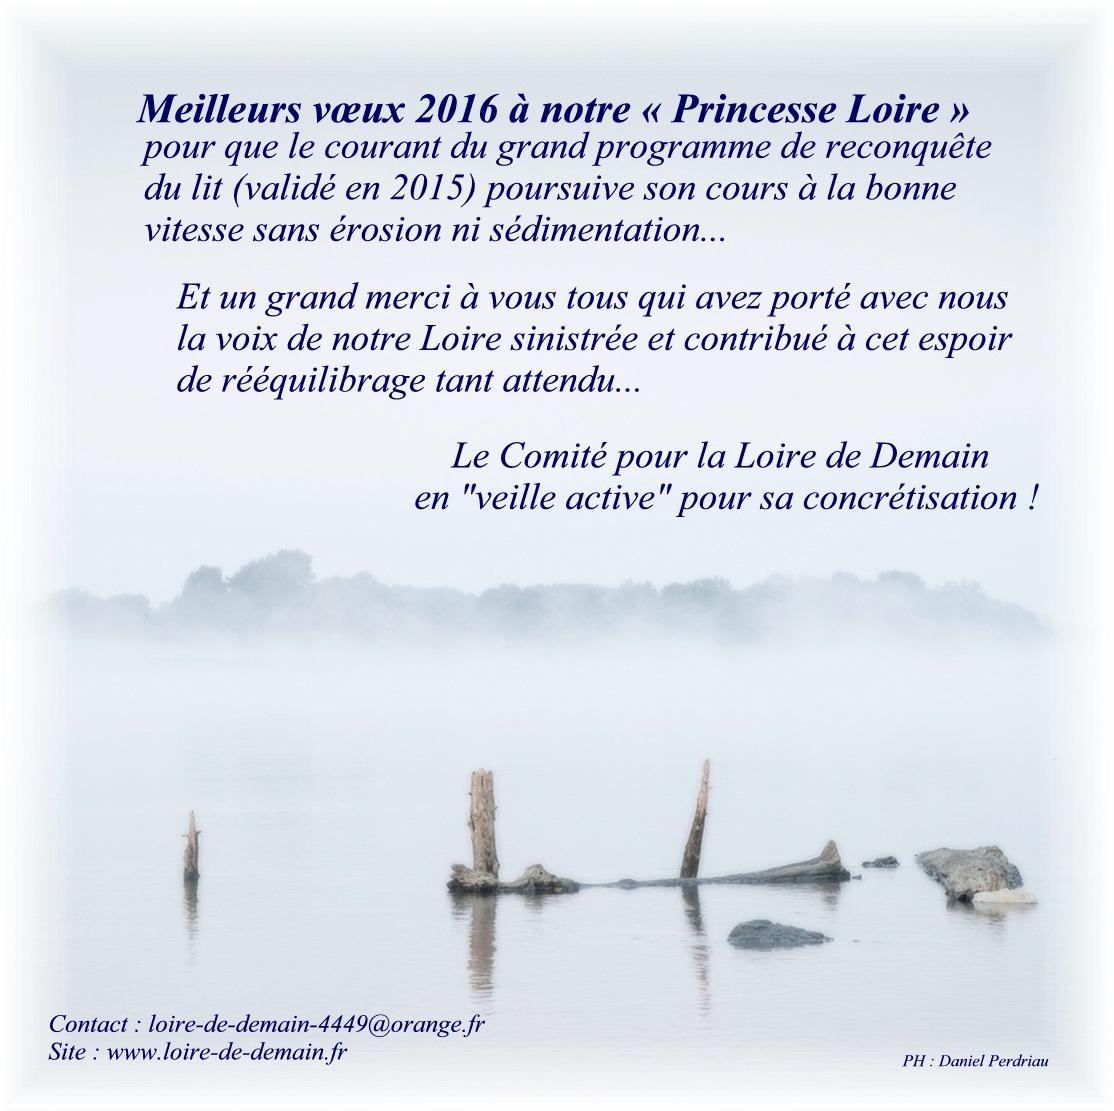 Princesse Loire